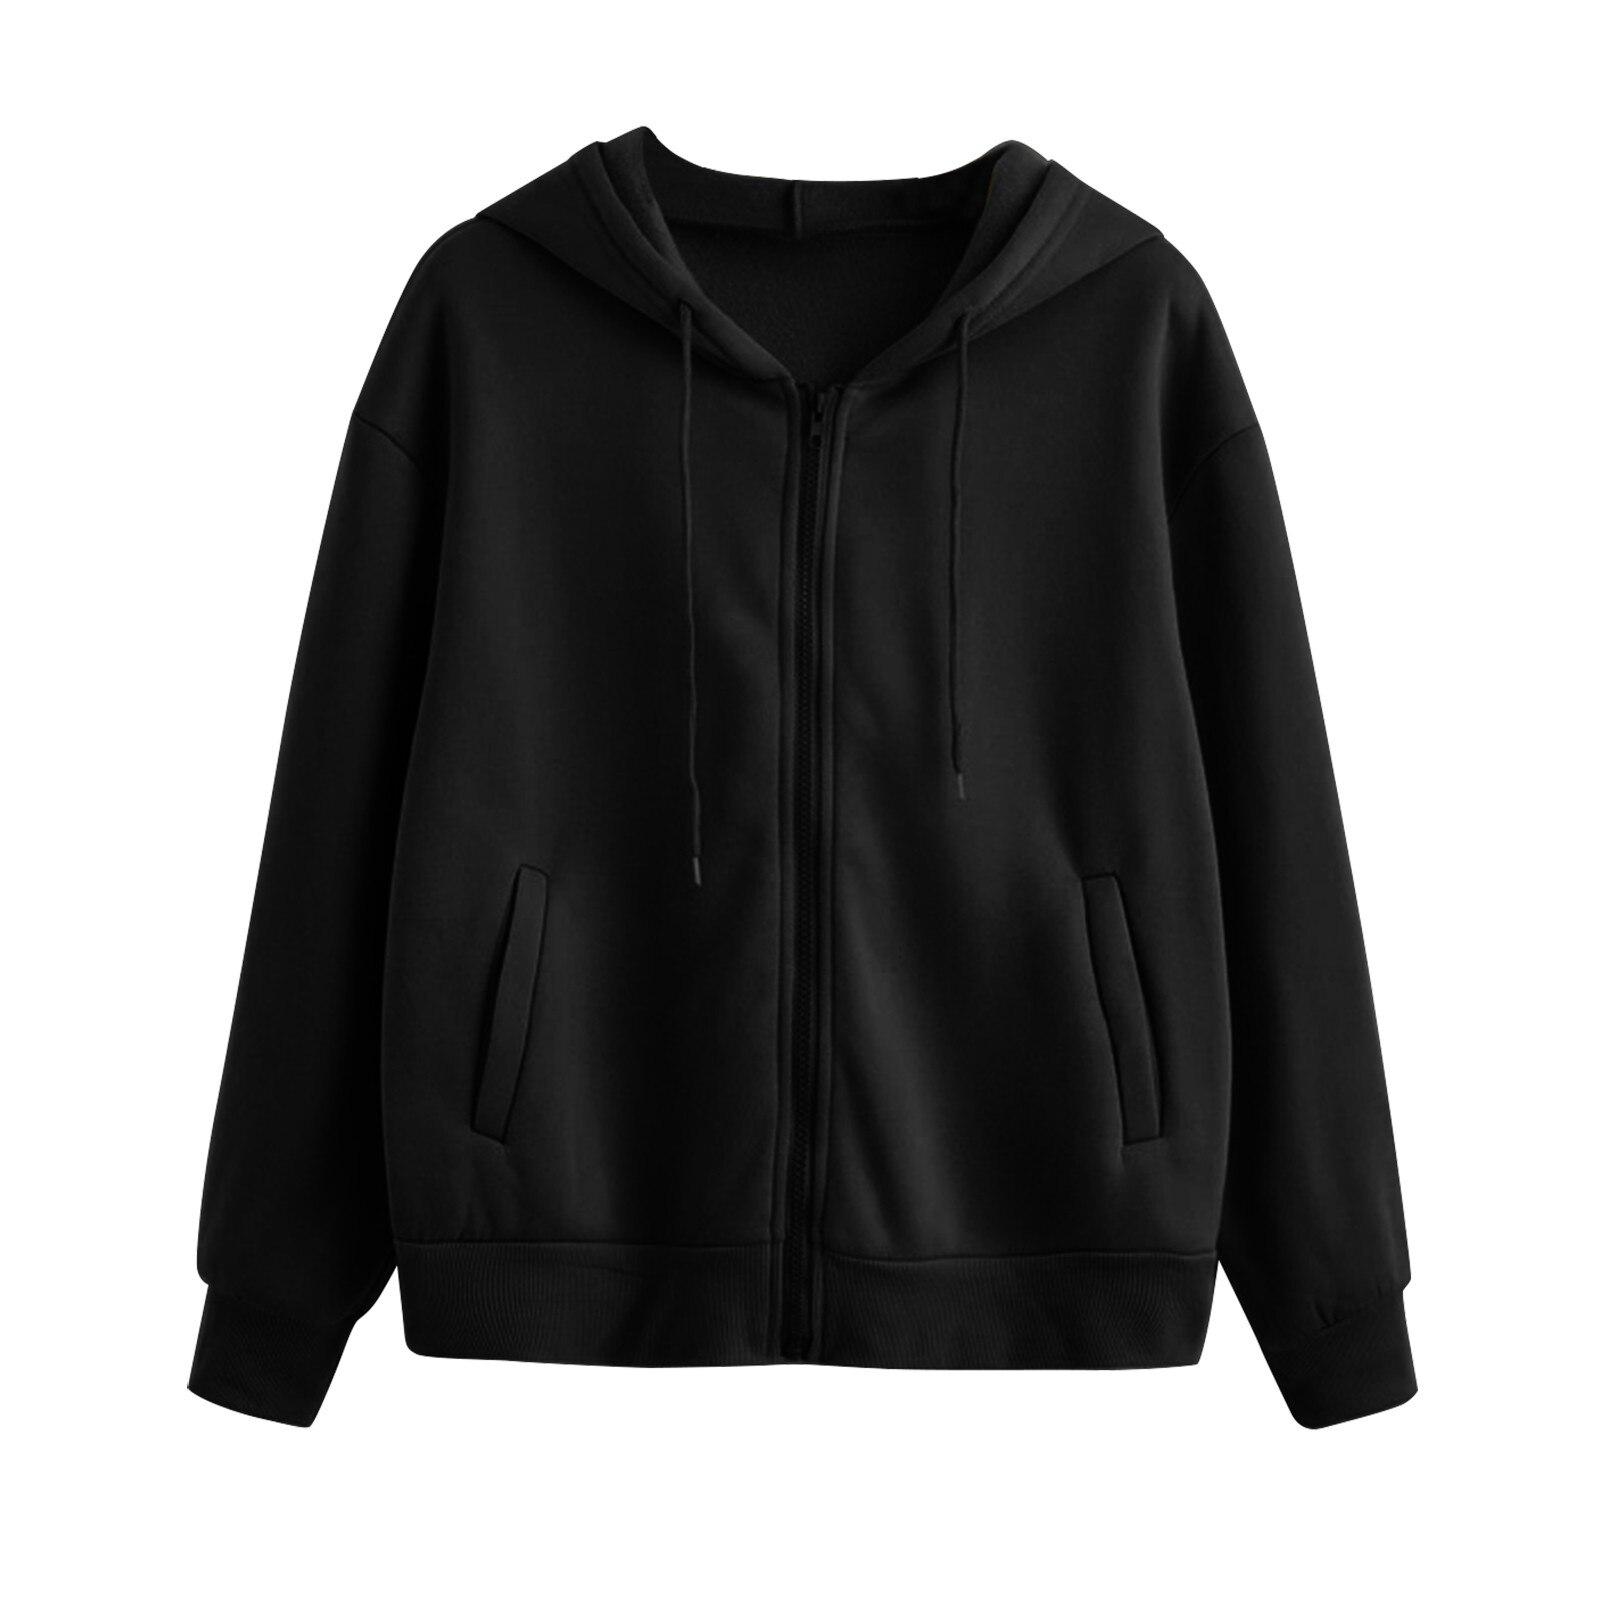 Lose Weight White Women Casual Solid Long Sleeve Zipper Pocket Shirt Hooded Sweatshirt Tops Hoodies Women Ropa Mujer 7